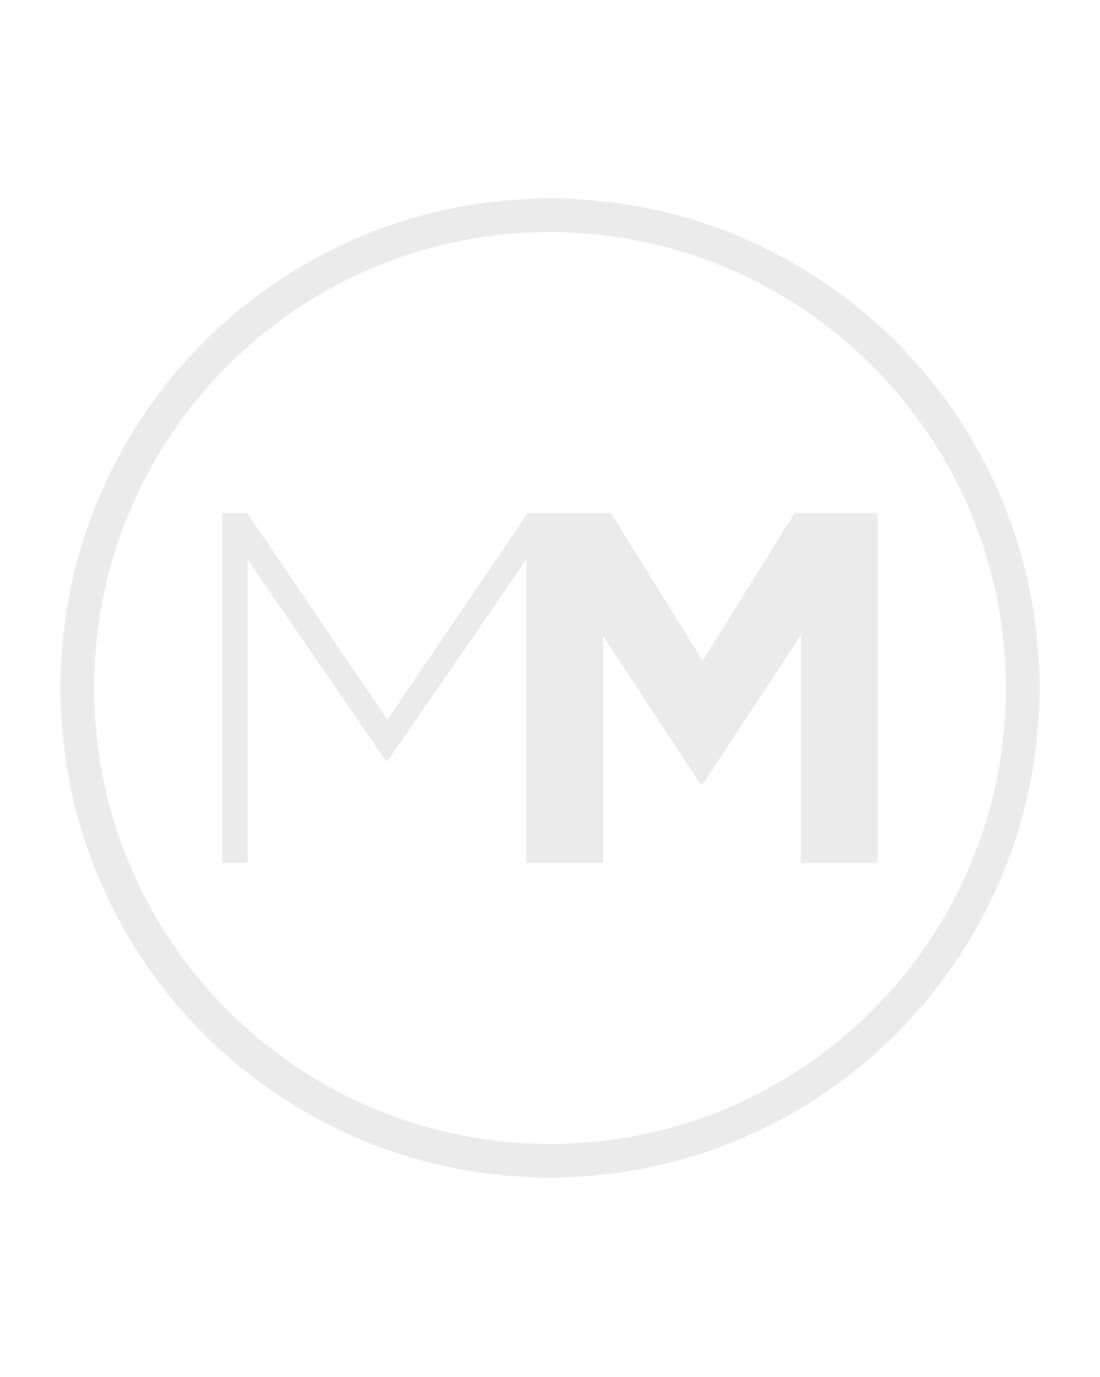 Modewereld Basics Kruisband Top Backend